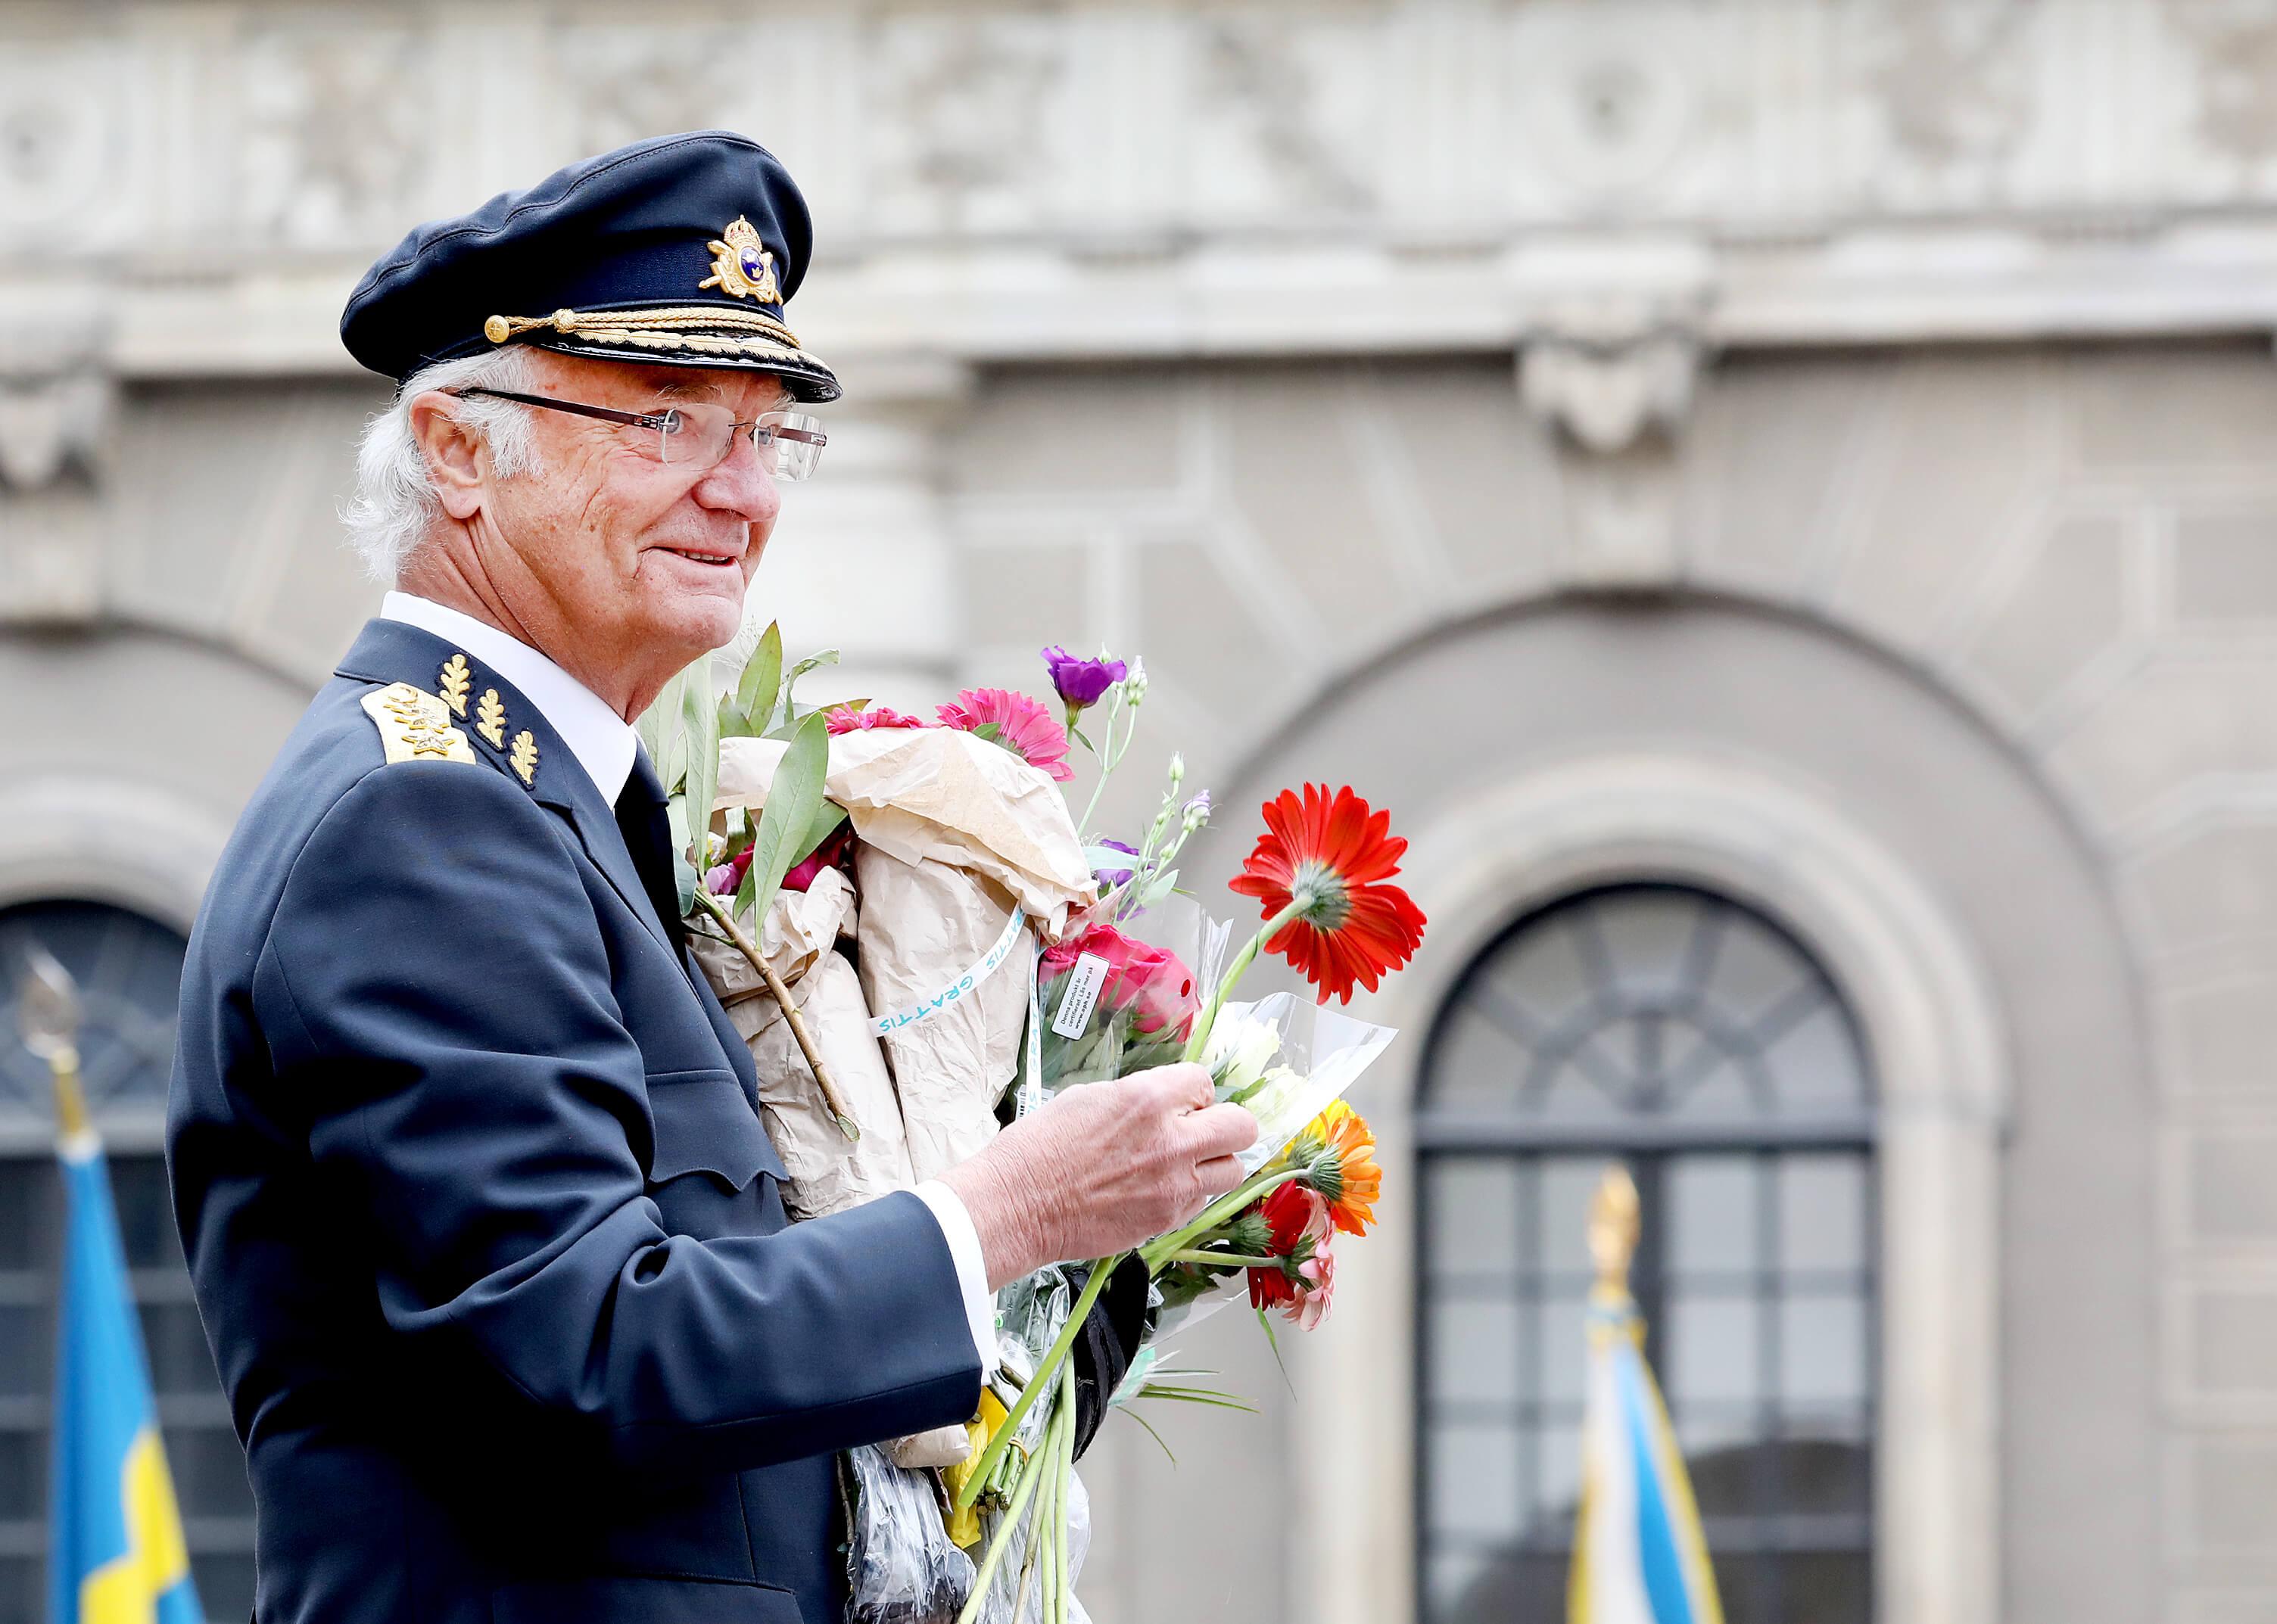 König Carl Gustaf, Carl Gustaf von Schweden